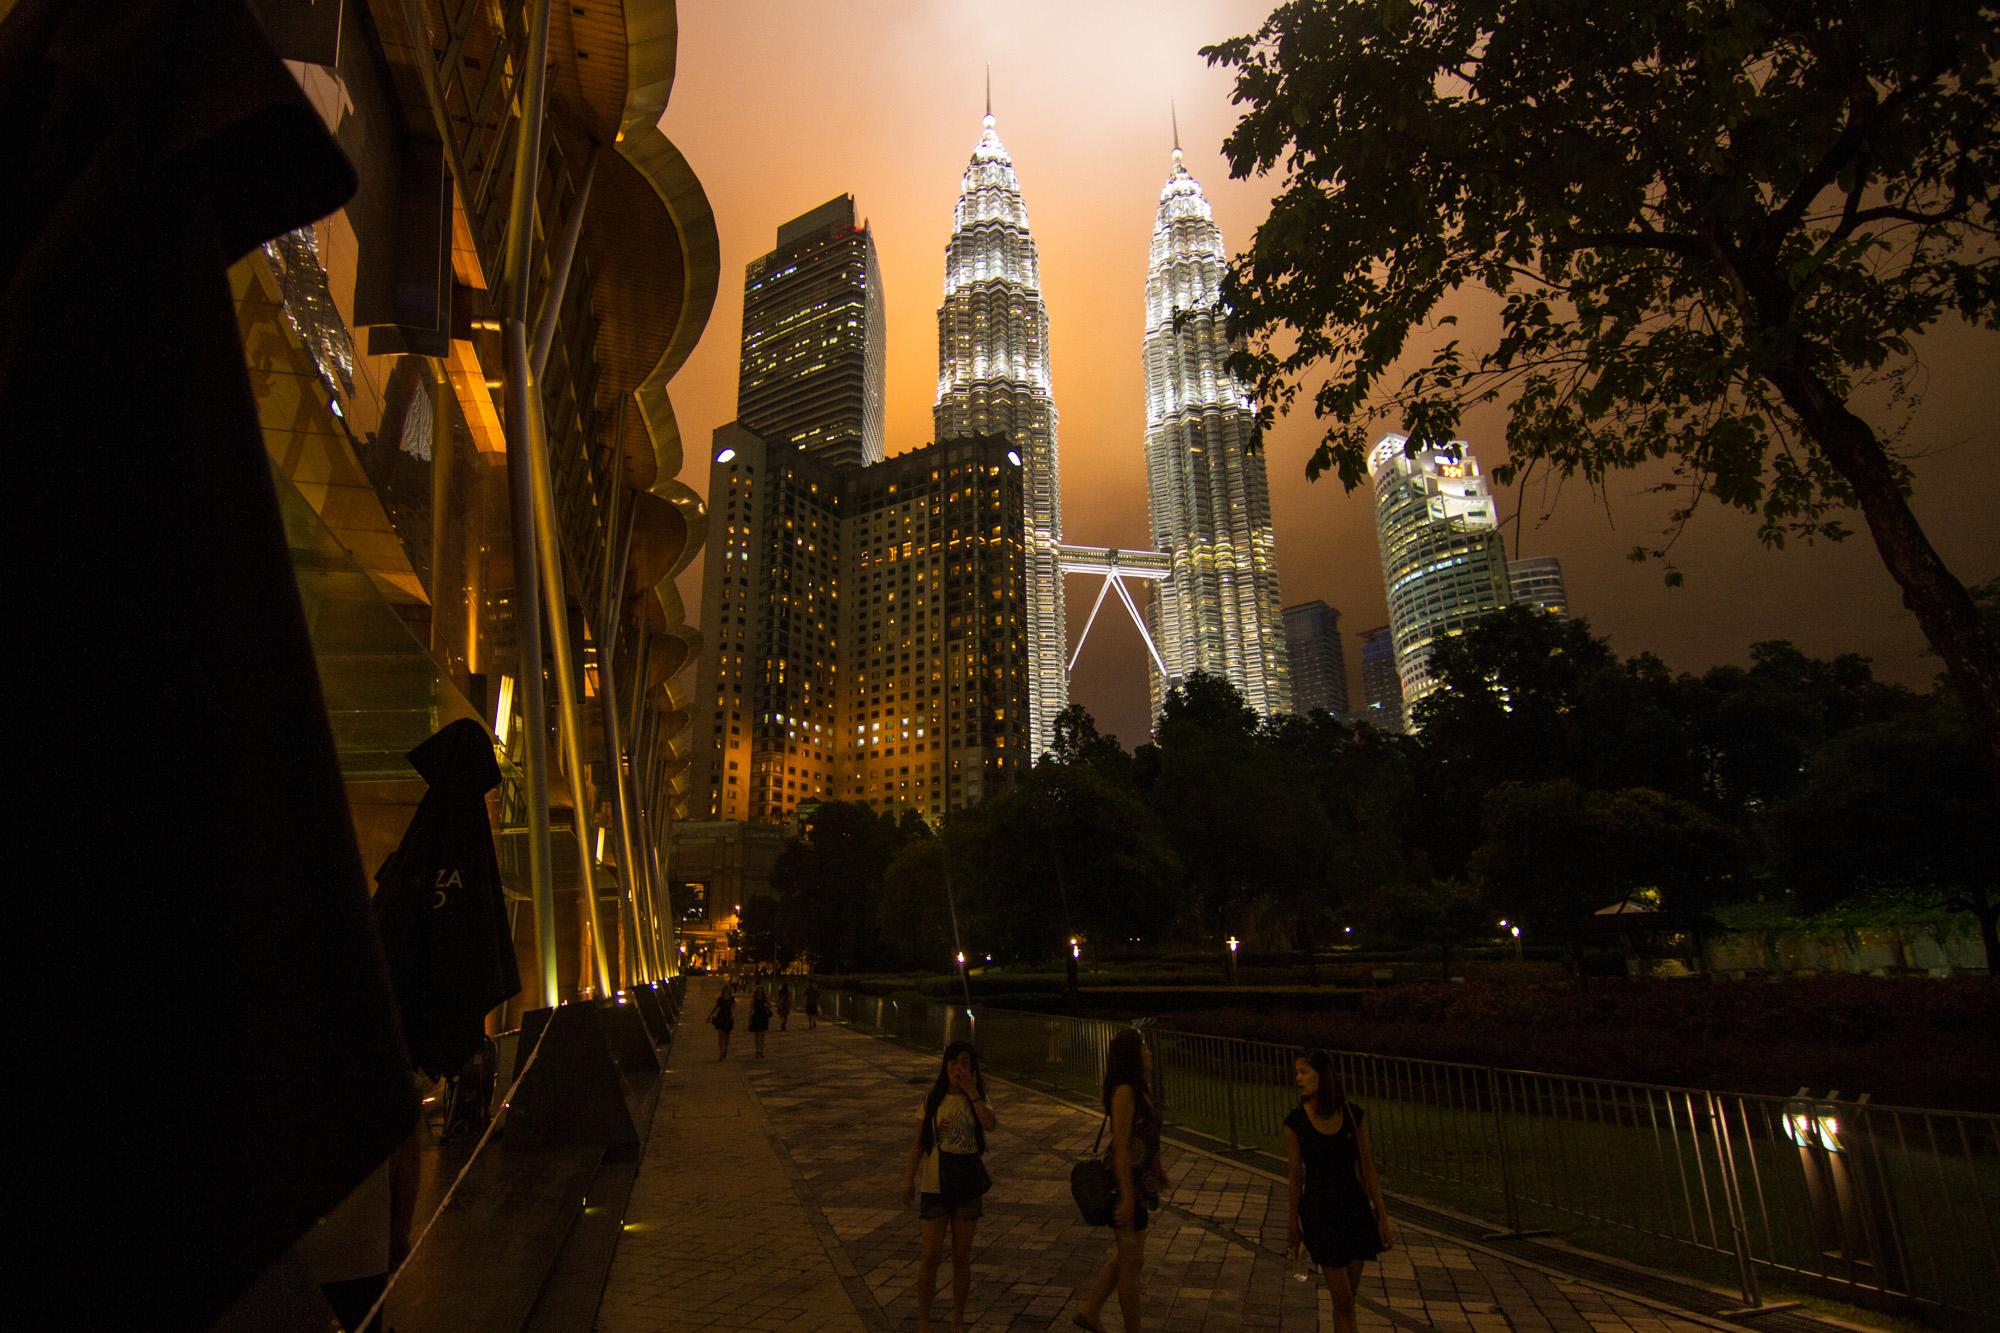 Petronas Towers  illuminated on a cloudy night in Kuala Lumpur